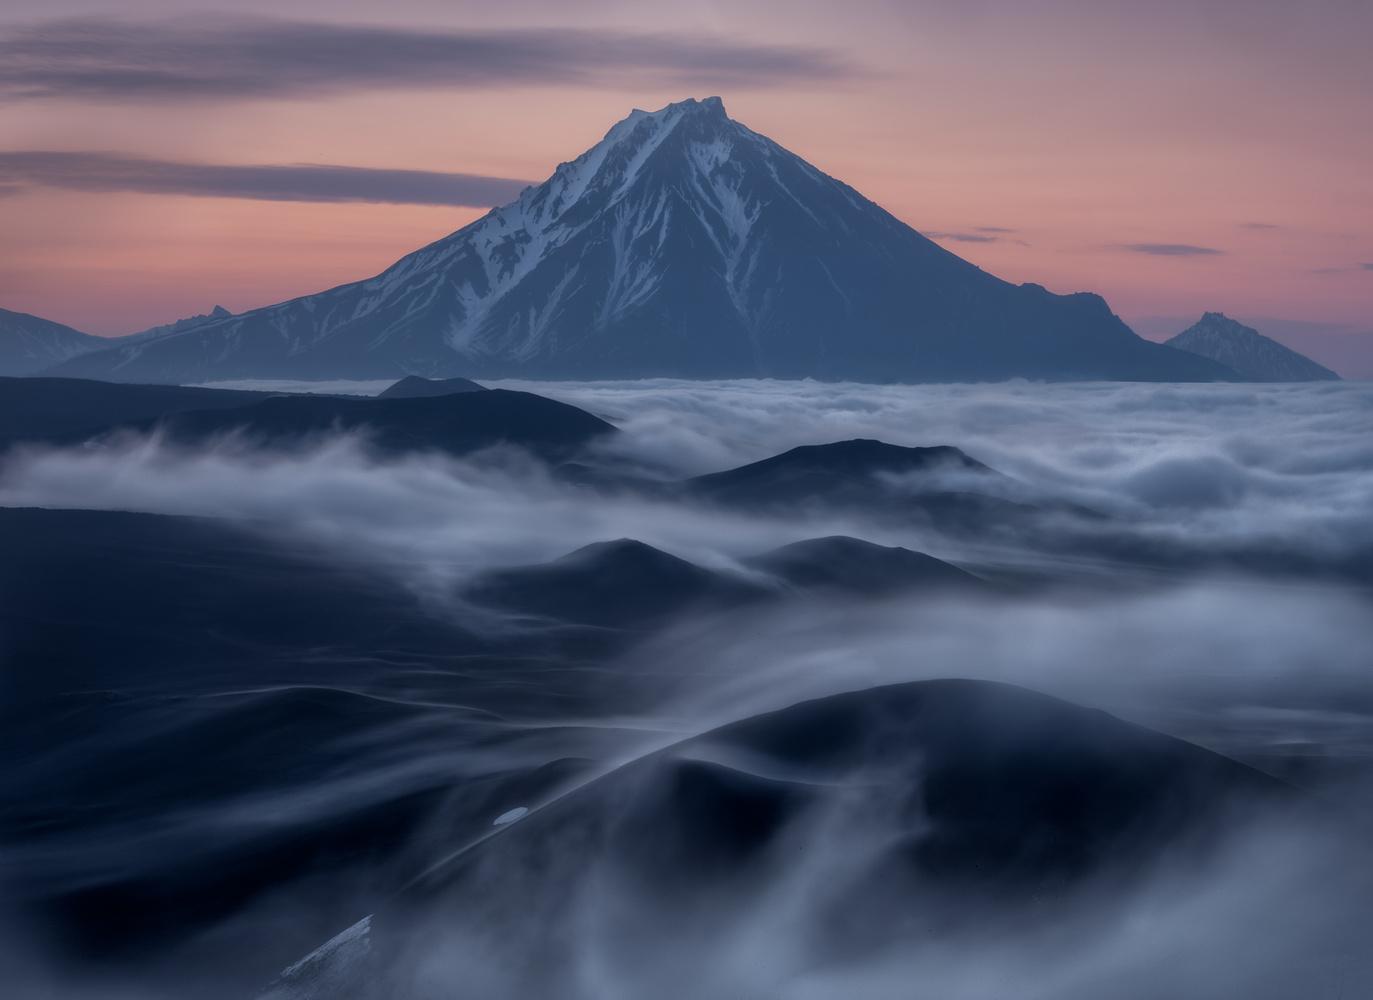 Sunrise among giants by Dan Zafra